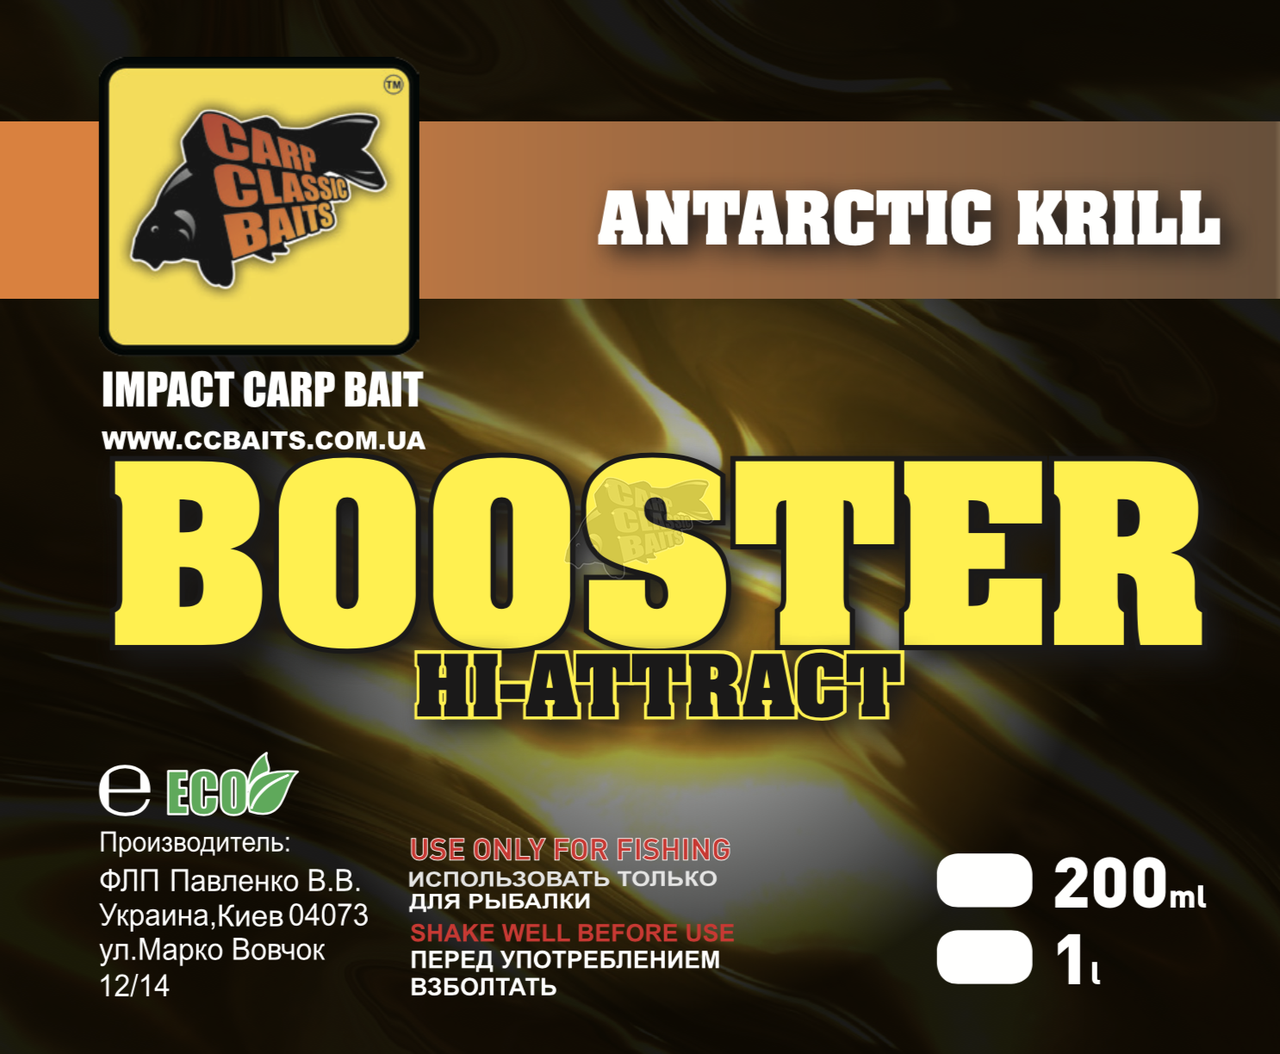 Бустер для Прикормки High-Attract Antarctic Krill [Антарктический Криль], 1000